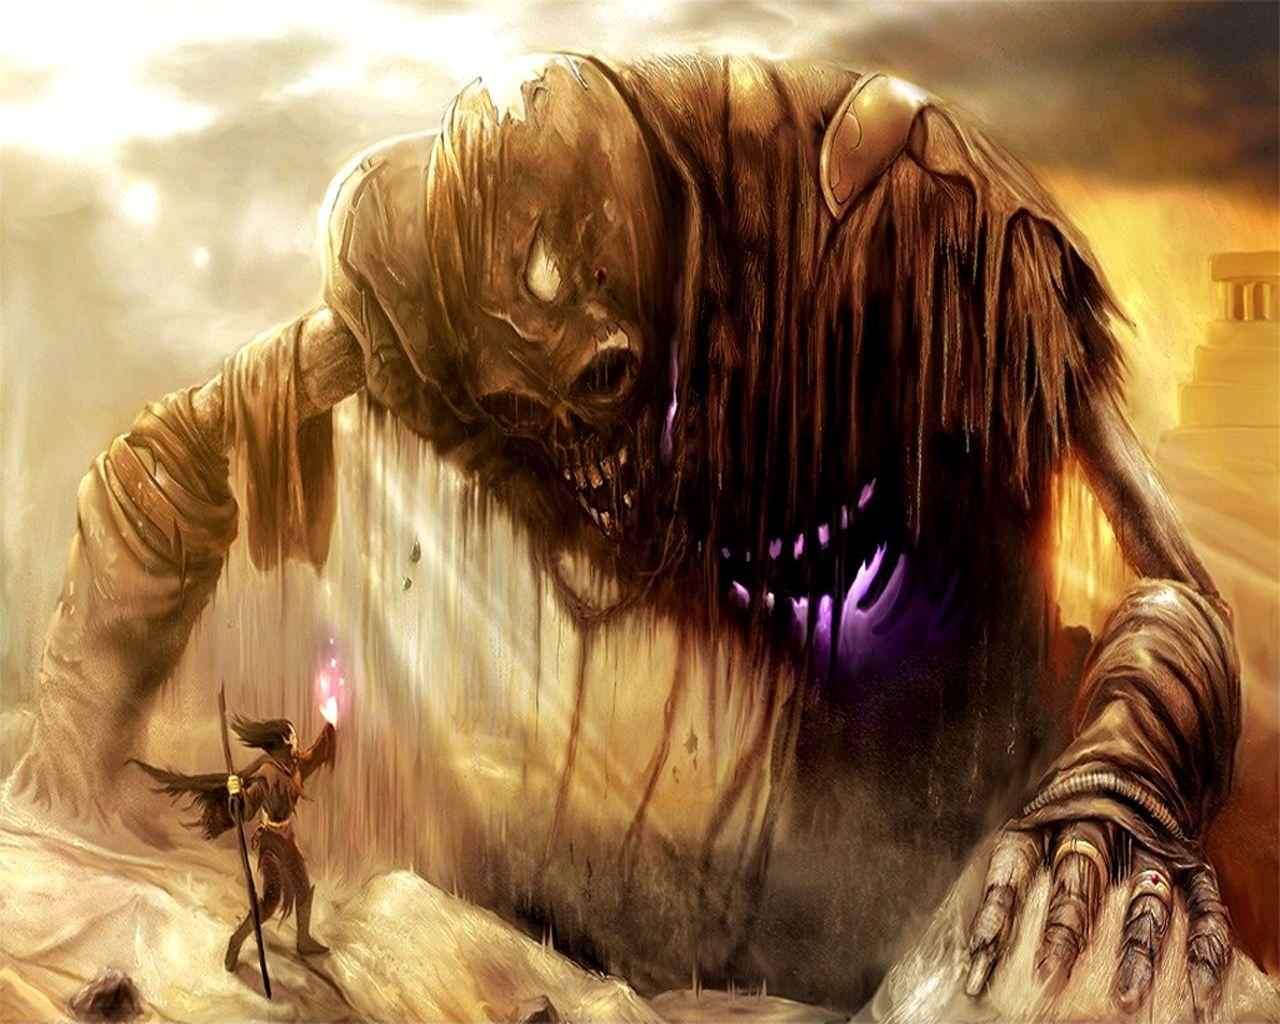 Pin By Icons Fantasy On V Znameni Opalu Fantasy Fantasy Monster Undead Fantasy giants wallpapers fantasy